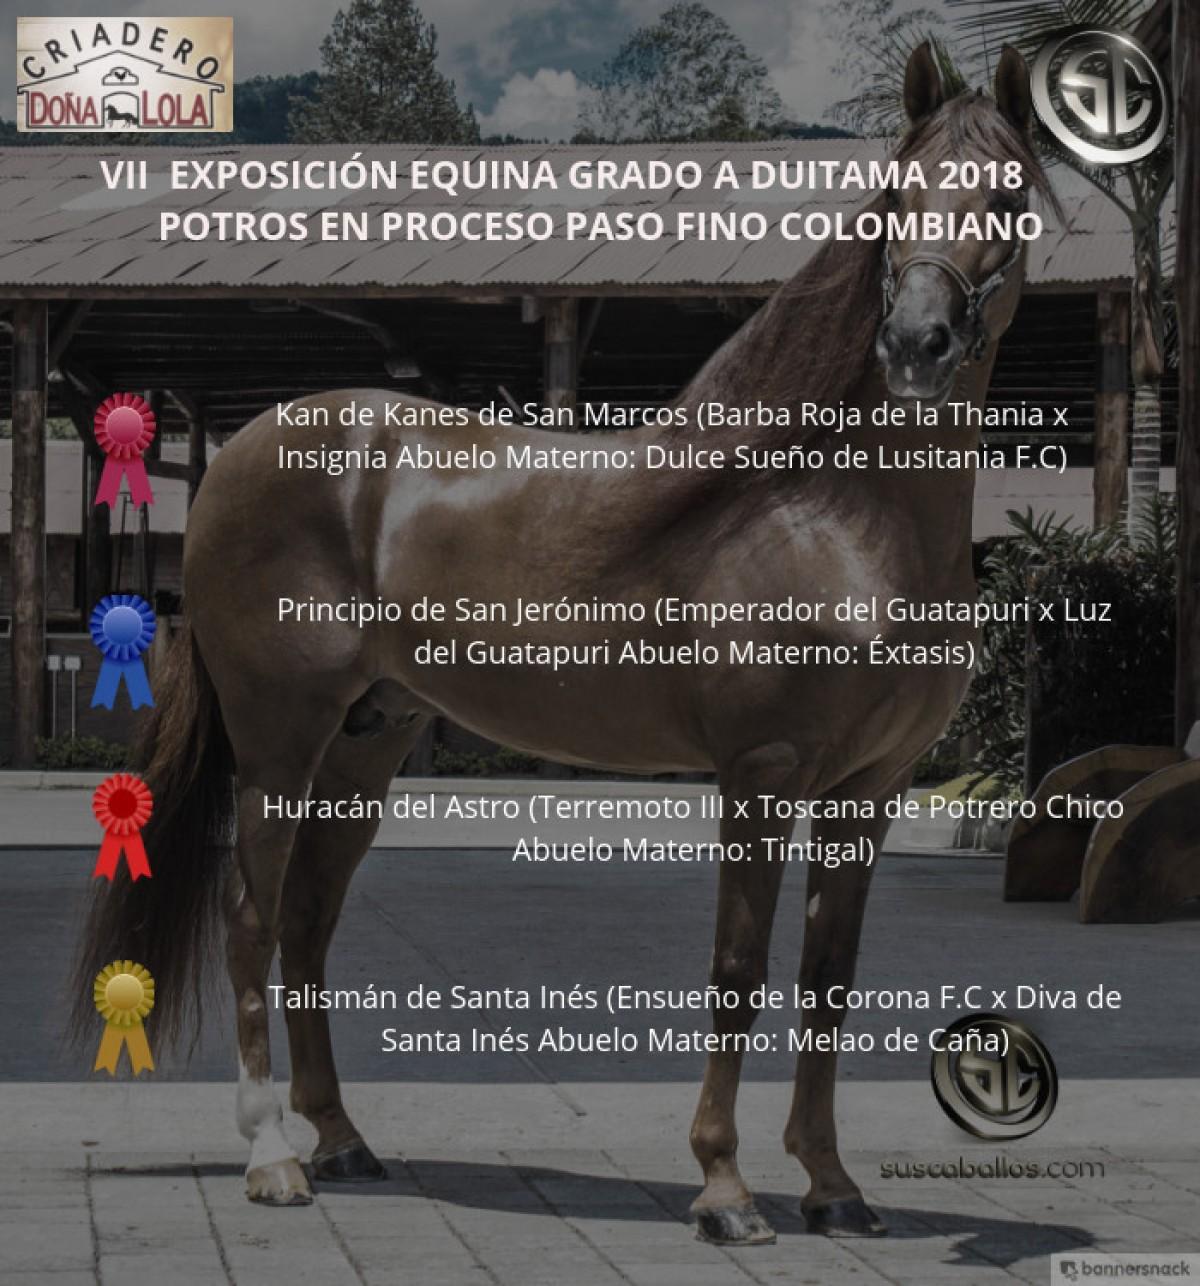 VÍDEO: Kan De Kanes Mejor, Principio 1er, Potros Paso Fino Colombiano, Duitama